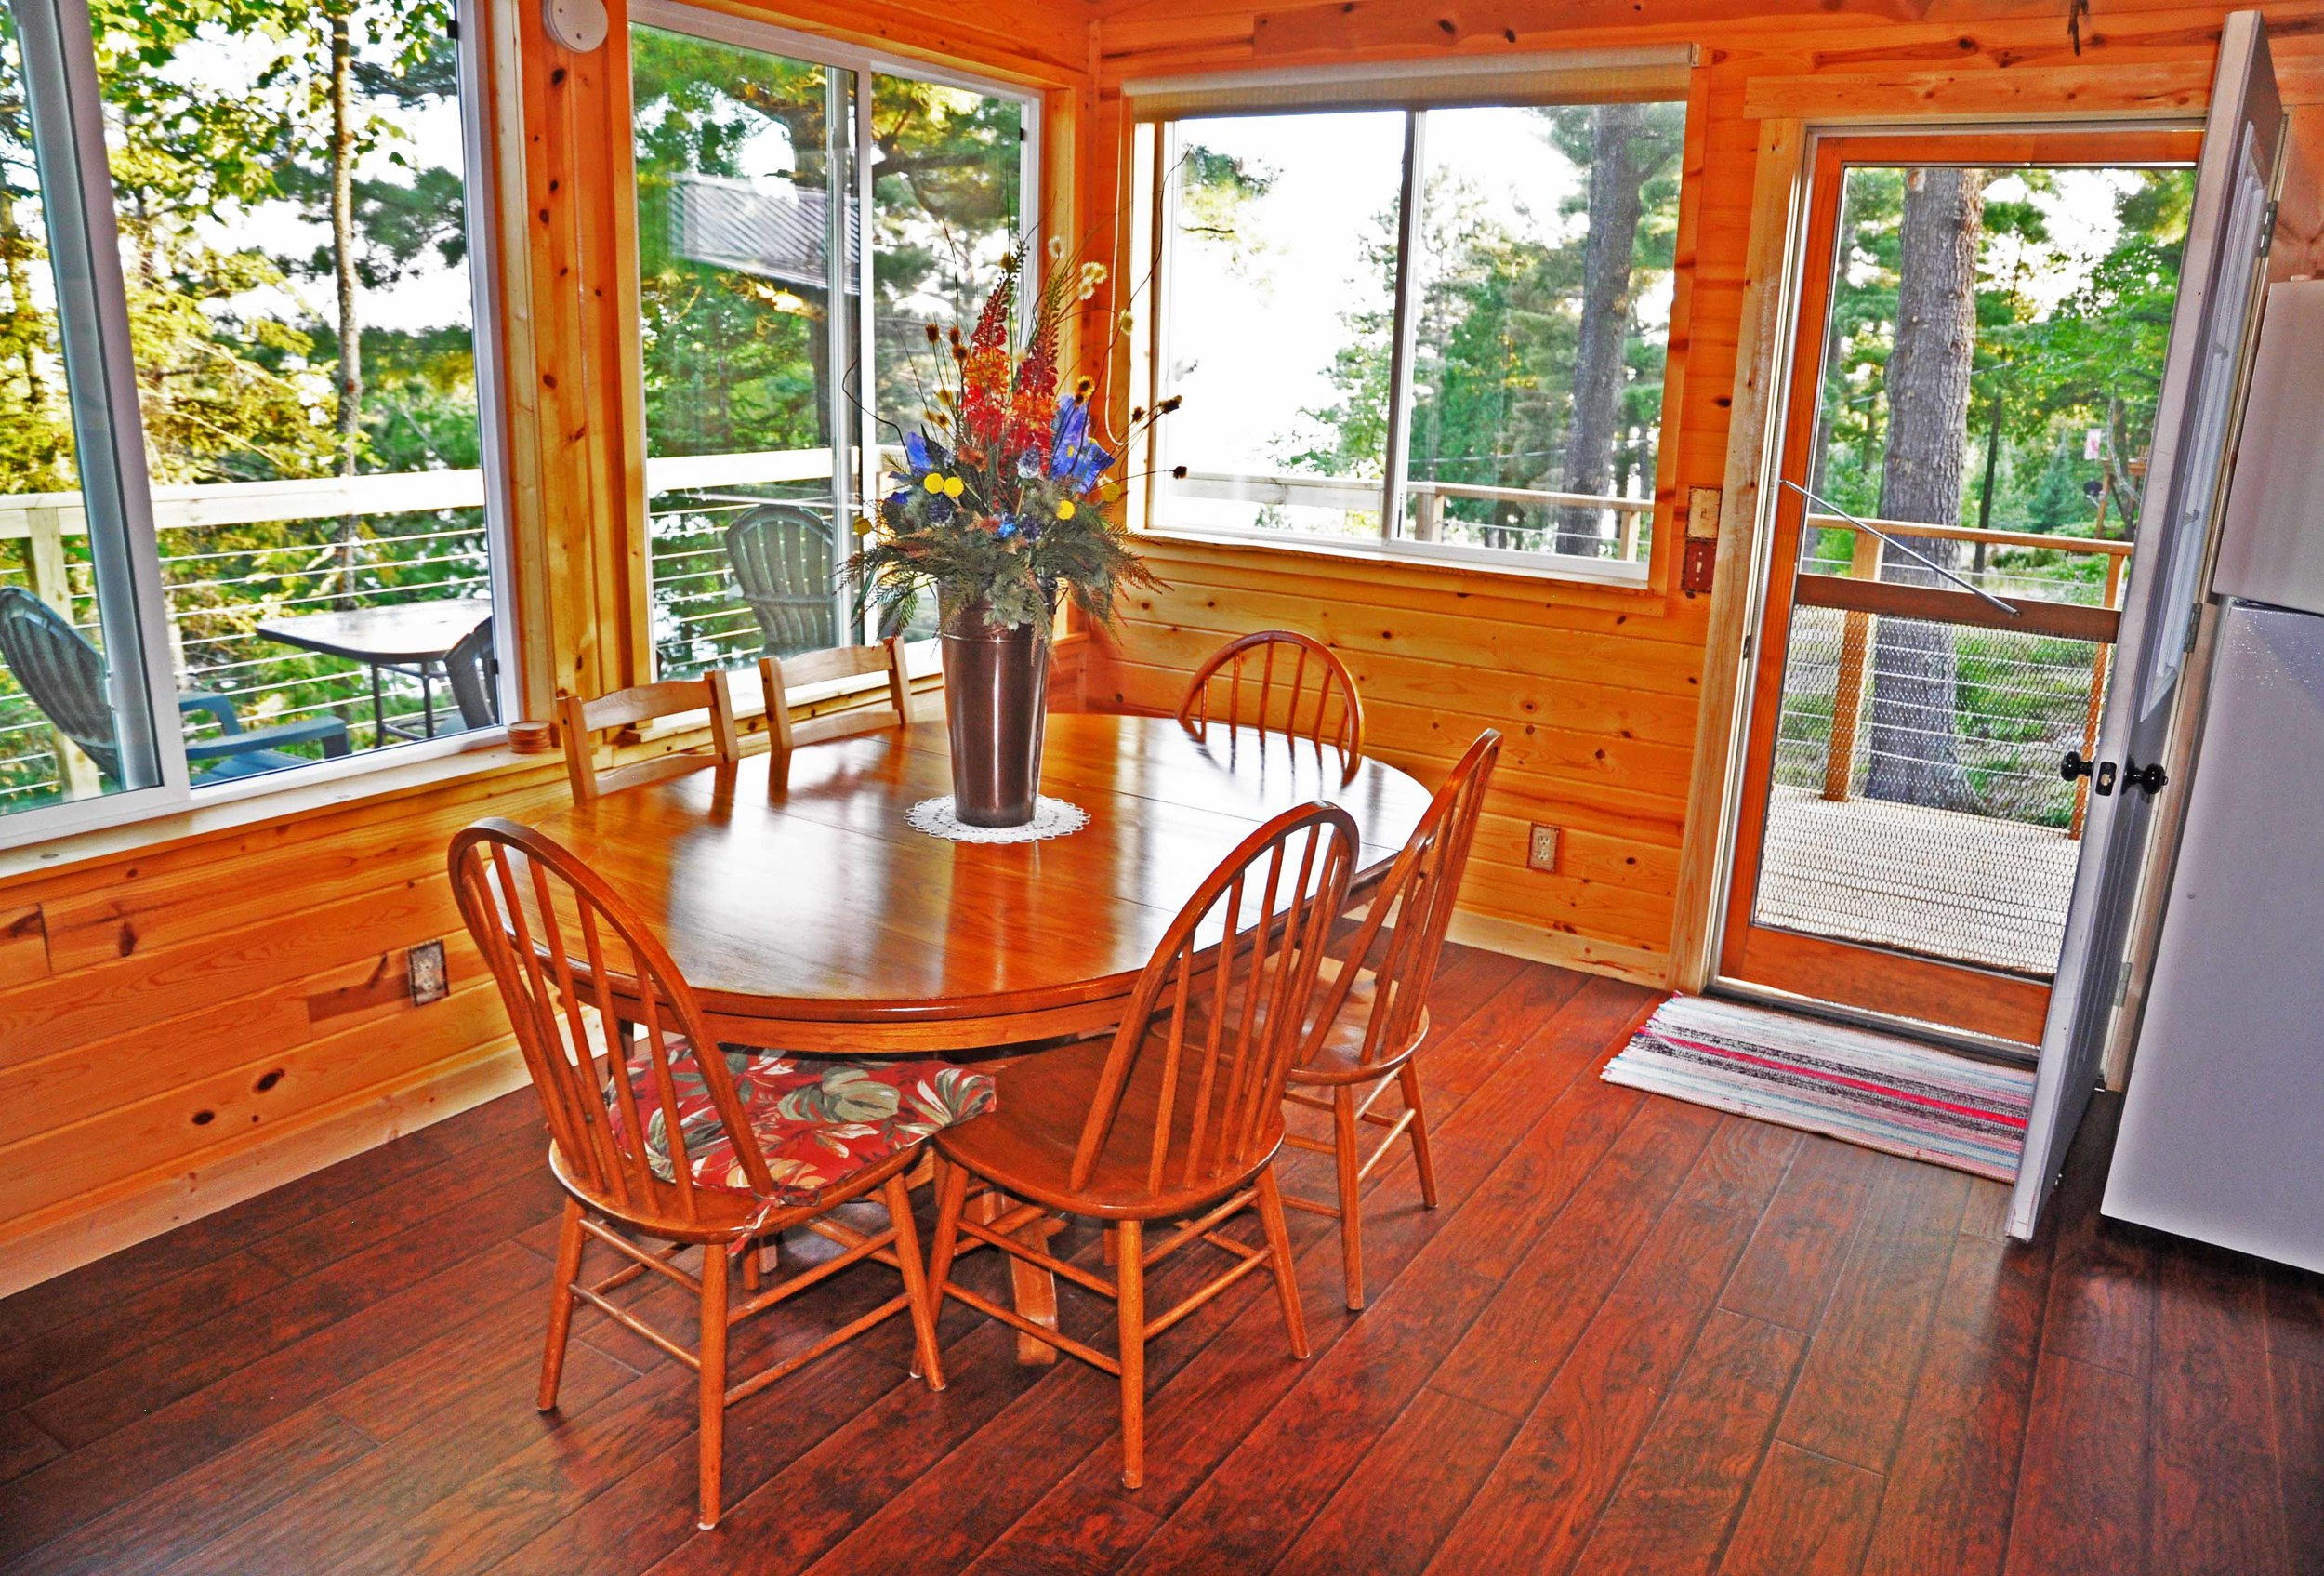 Kitchen and Deck View Web.jpg